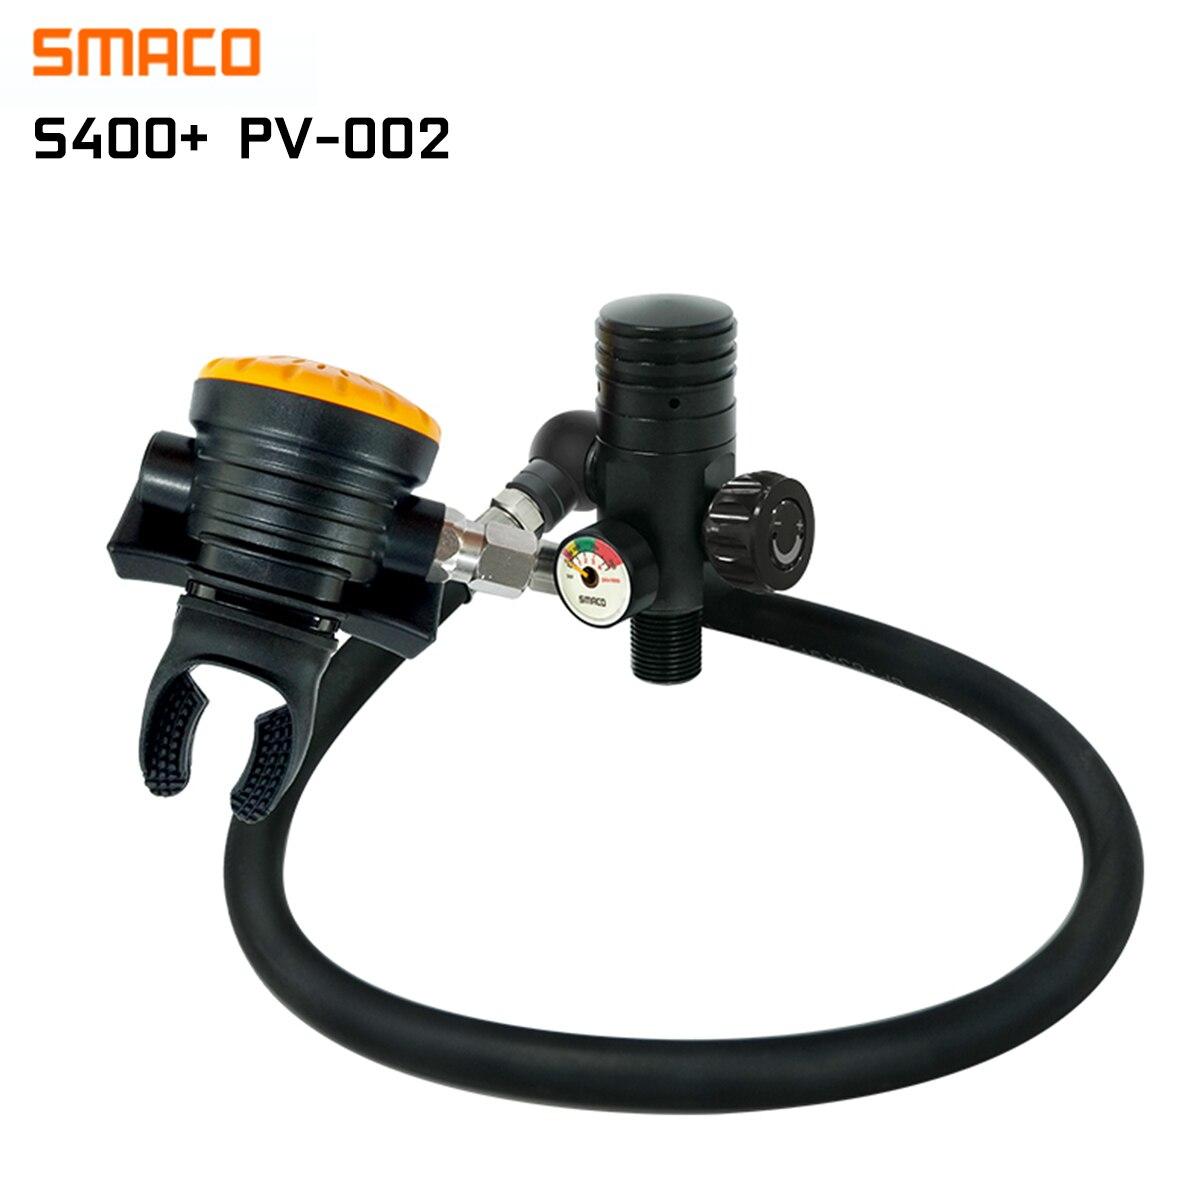 SMACO S400 Plus 3/8-24UNF Scuba Oxygen Diving Medium Pressure Tube Second Level Breathing First Level Pressure Reducing Valve